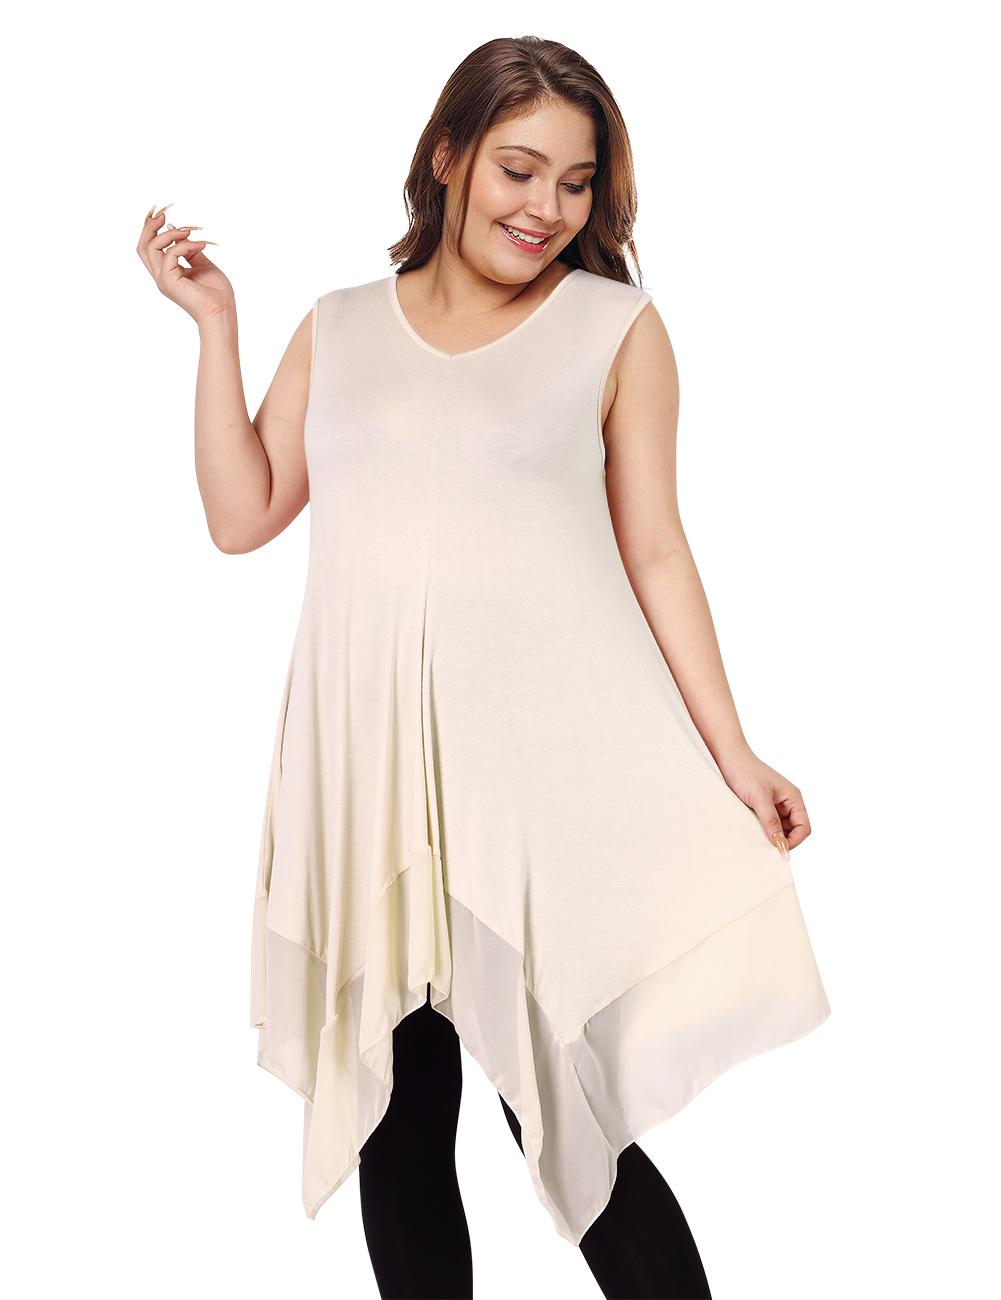 Clearlove Women's Plus Size Solid V Neck Sleeveless Irregular Hem Loose Shirt Dress Top